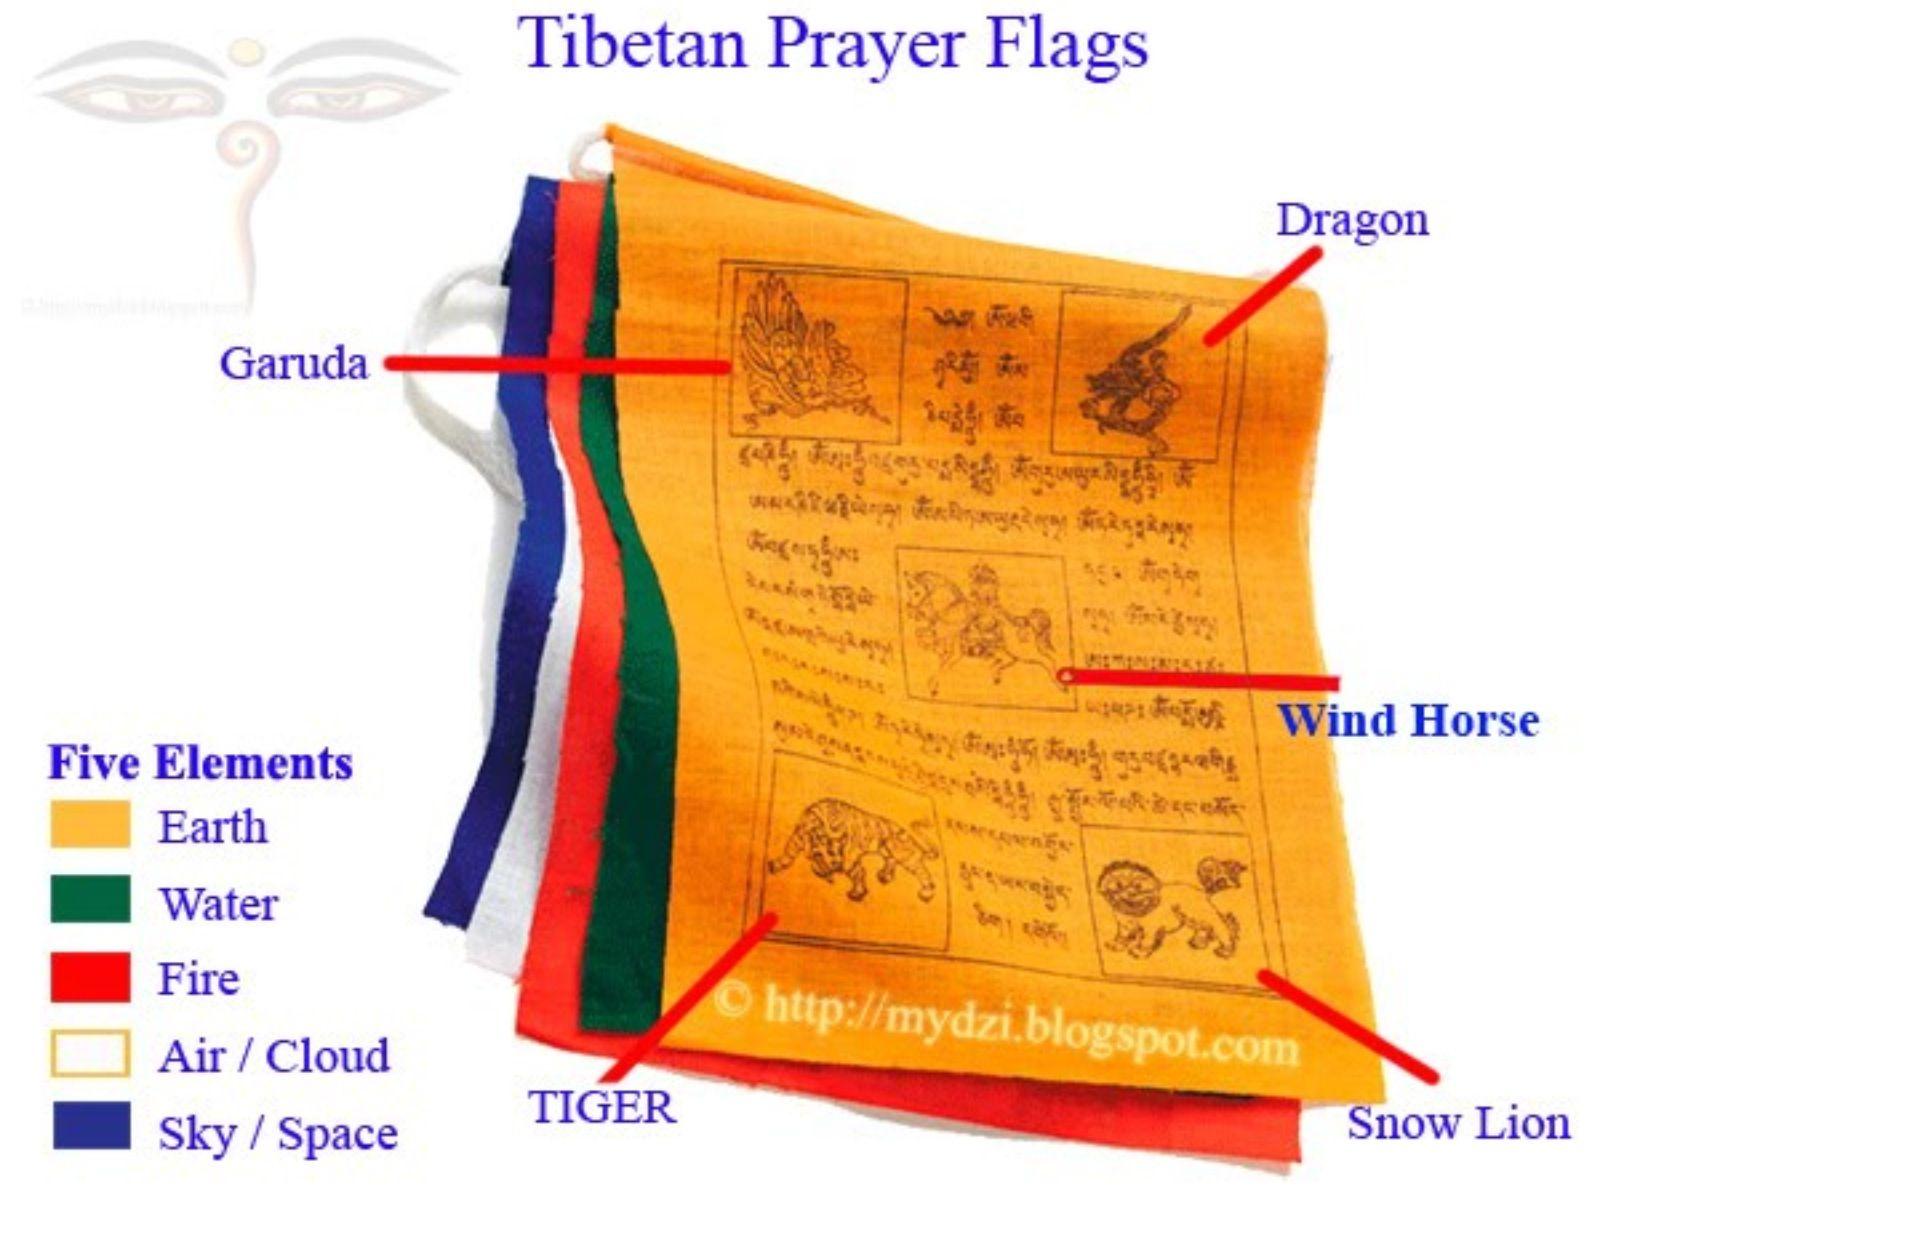 Tibetan prayer flags colors and symbolic meanings meditation tibetan prayer flags symbolism of colors biocorpaavc Gallery